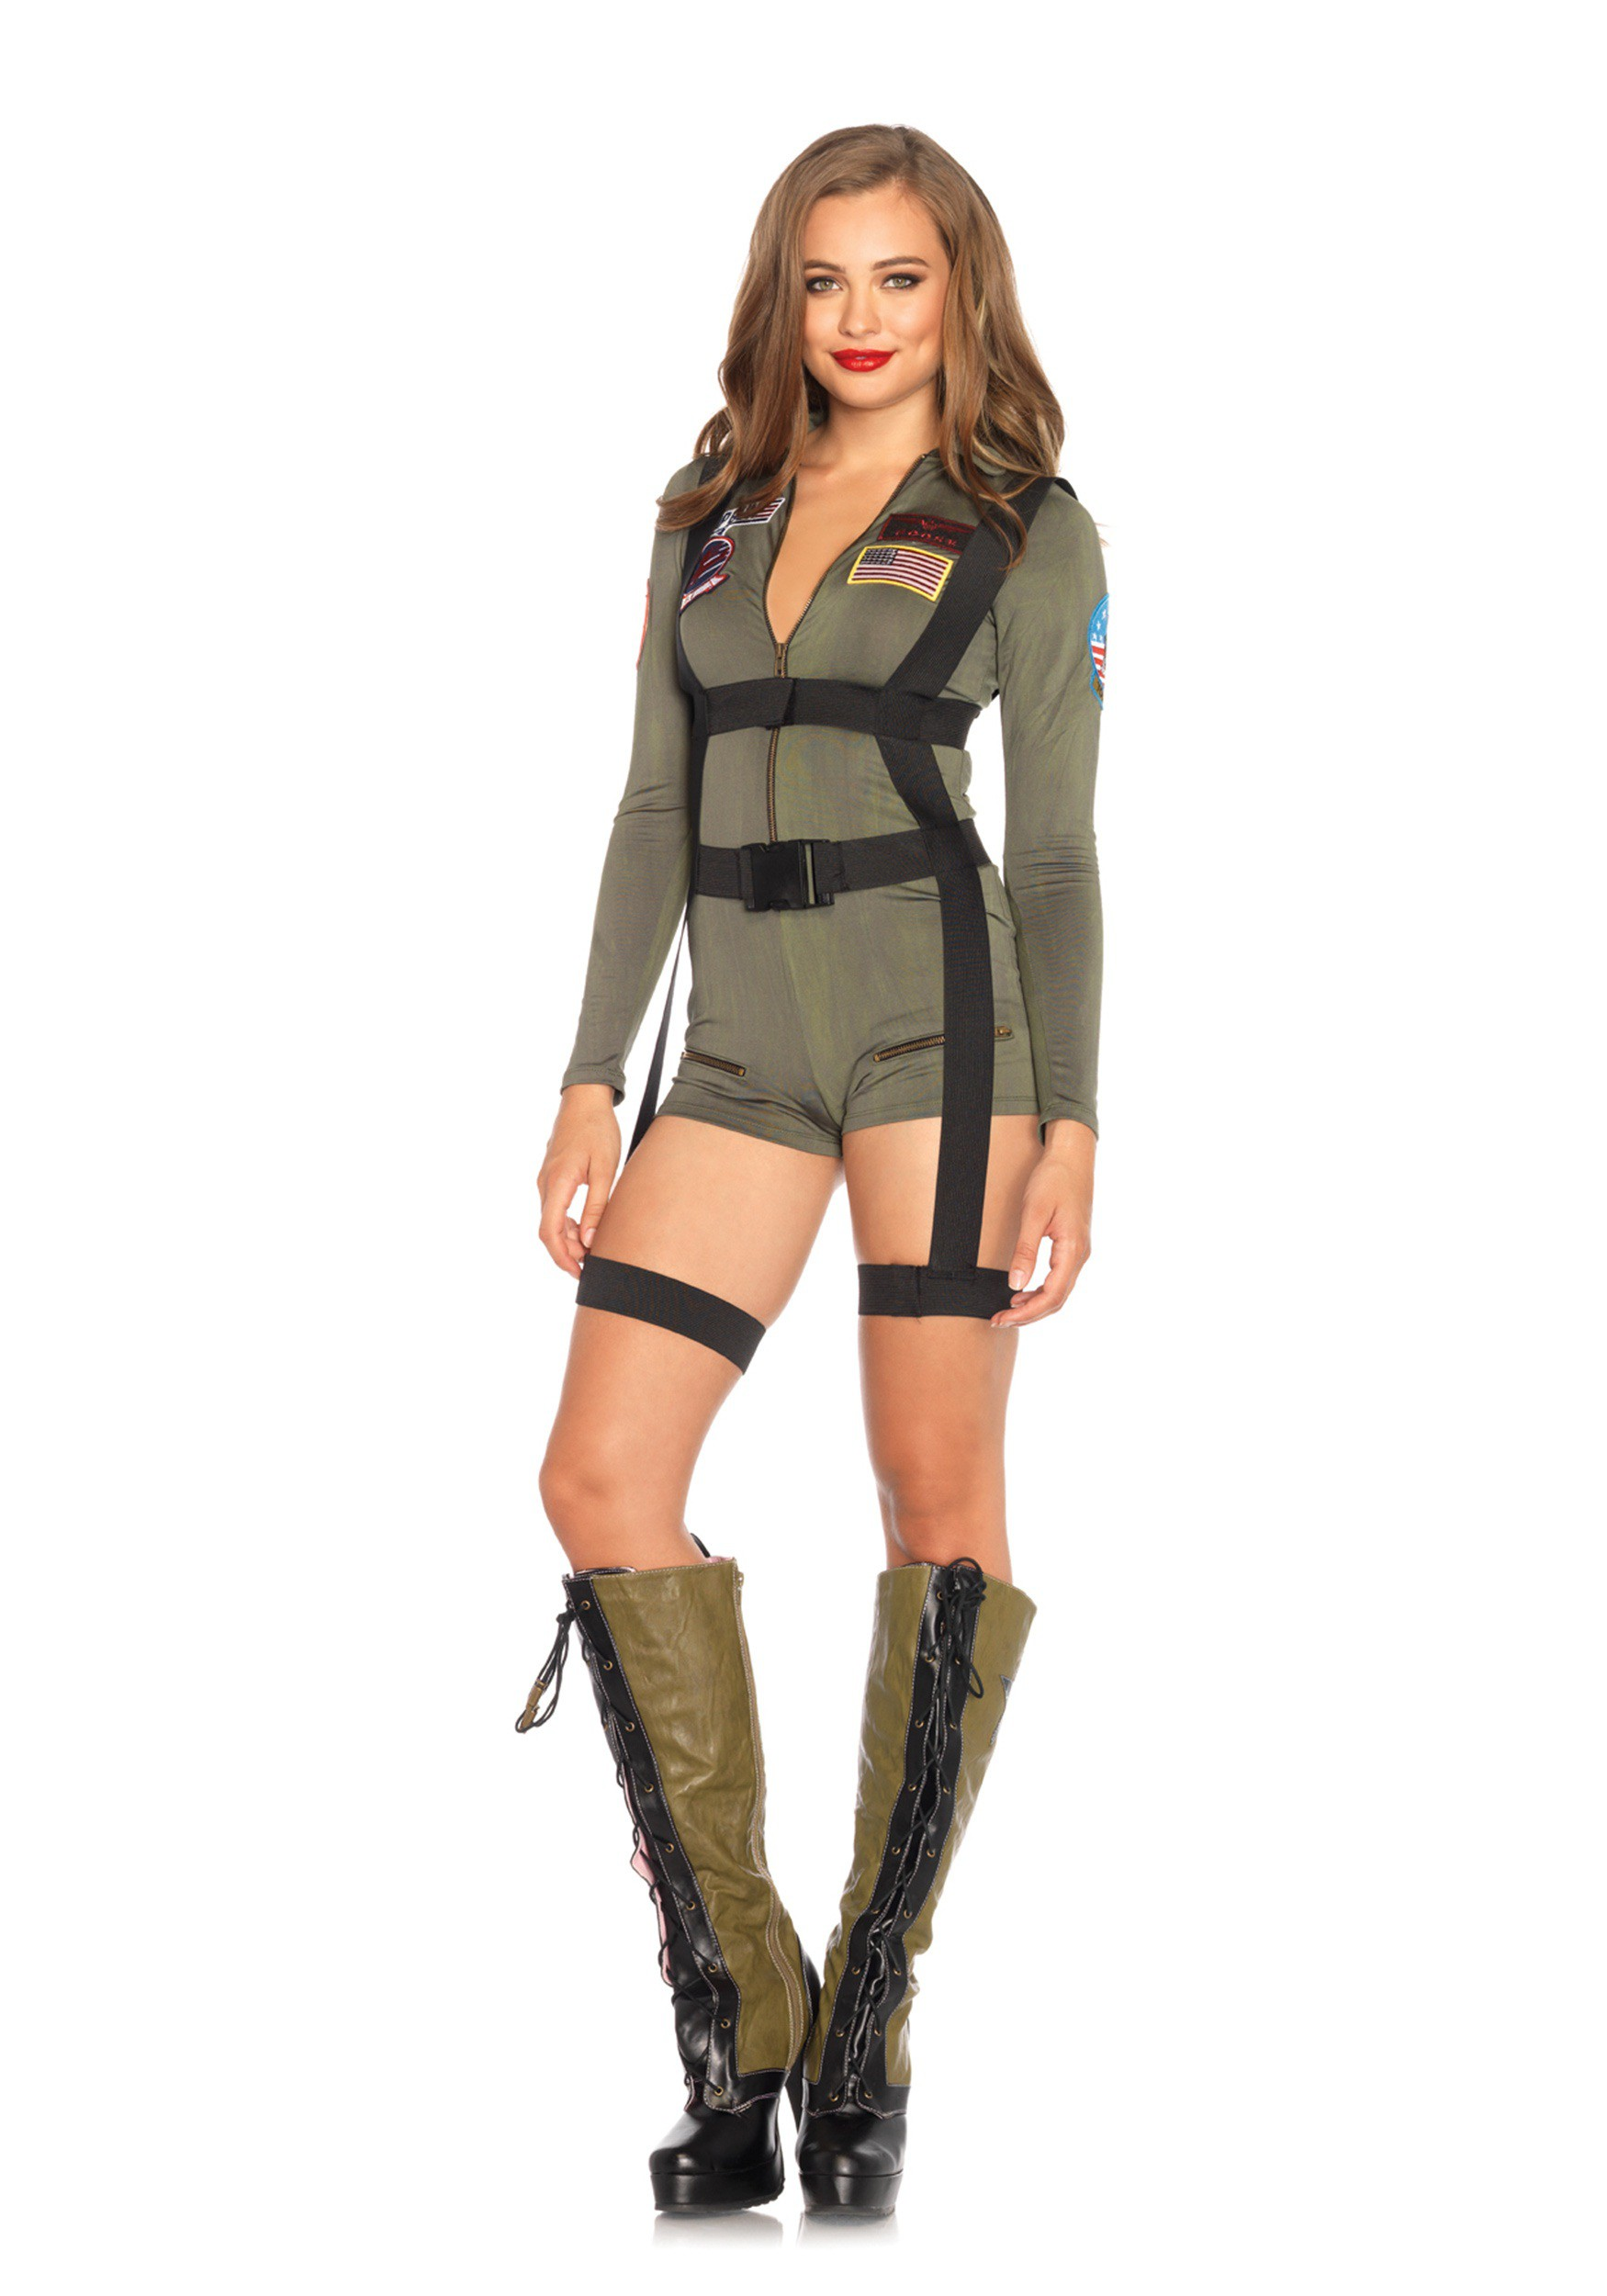 Navy Pin Up Girl Wallpaper Women S Top Gun Romper Costume